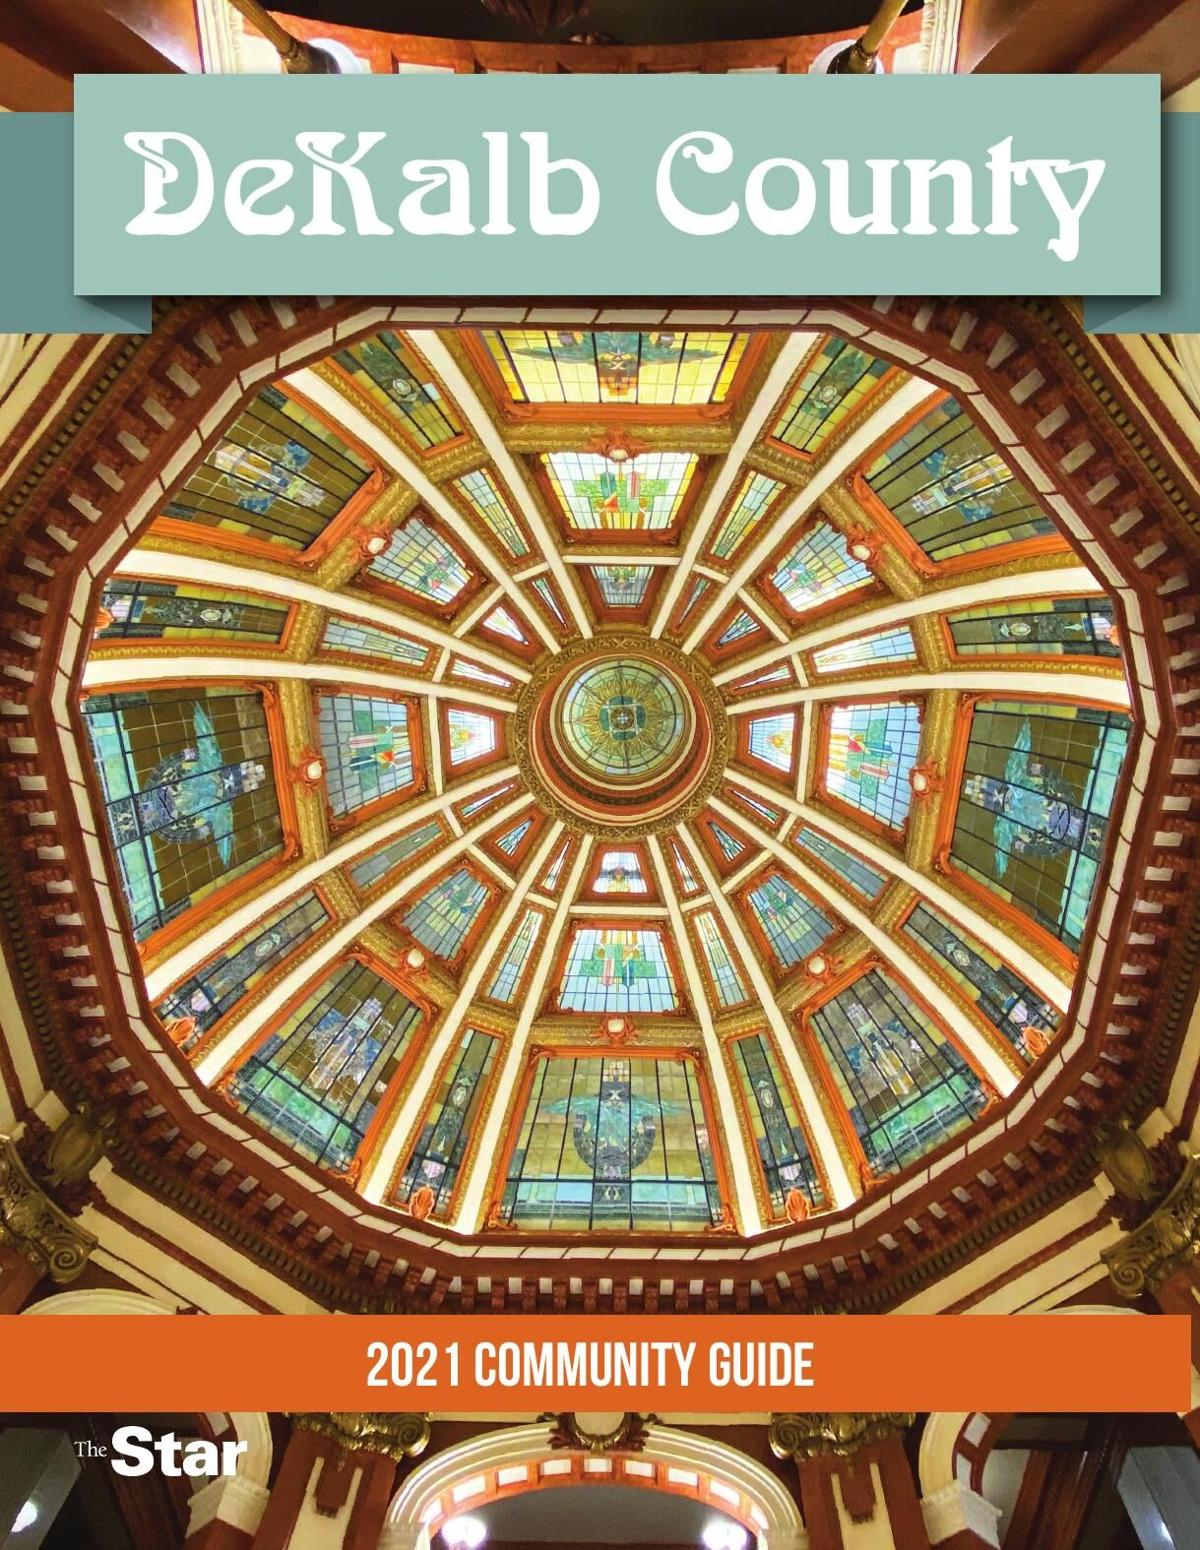 Dekalb County Community Guide 2021